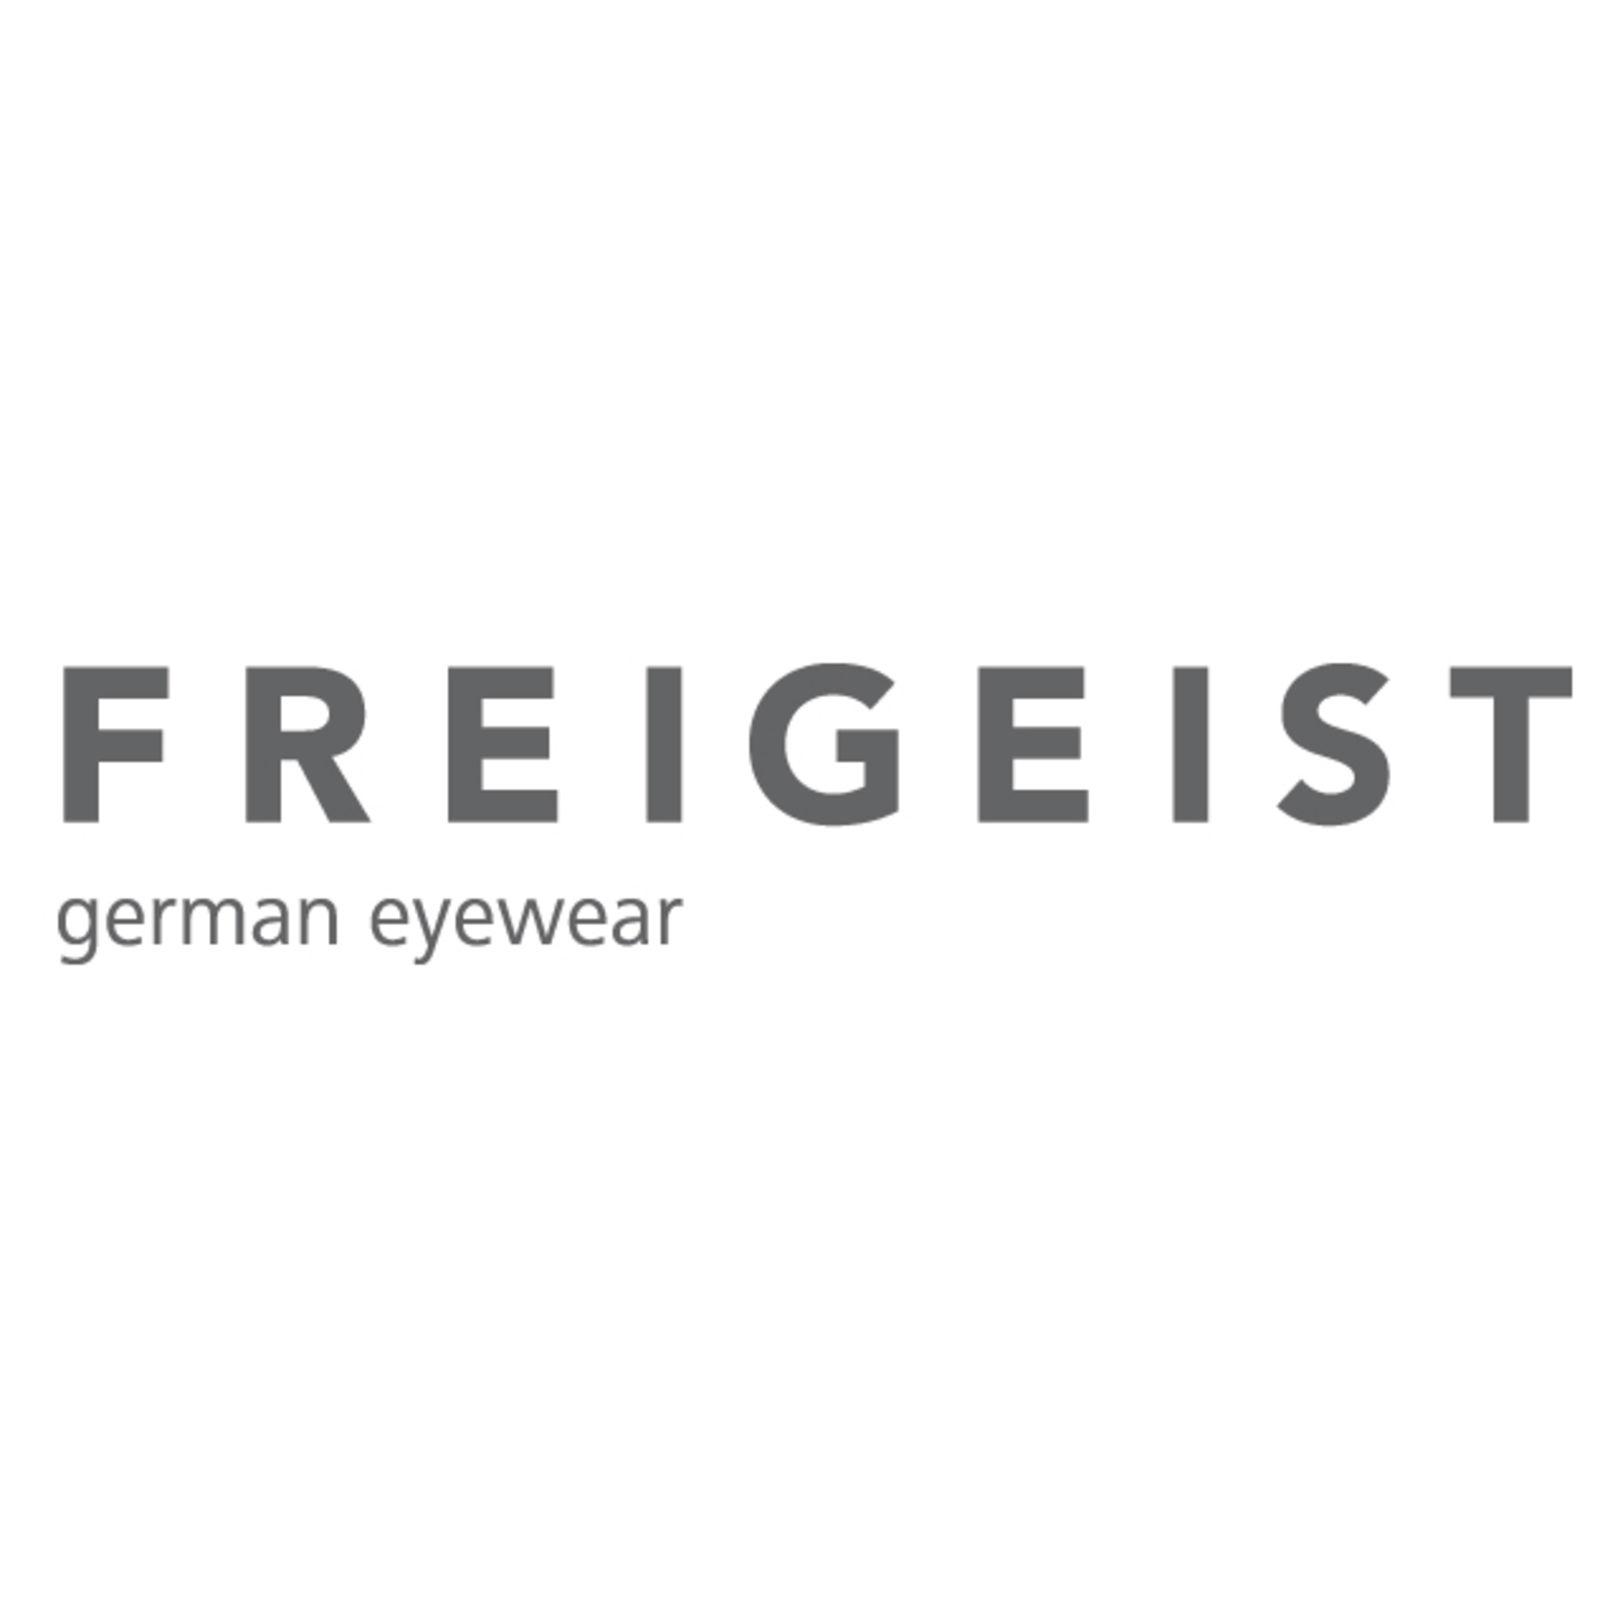 FREIGEIST eyewear